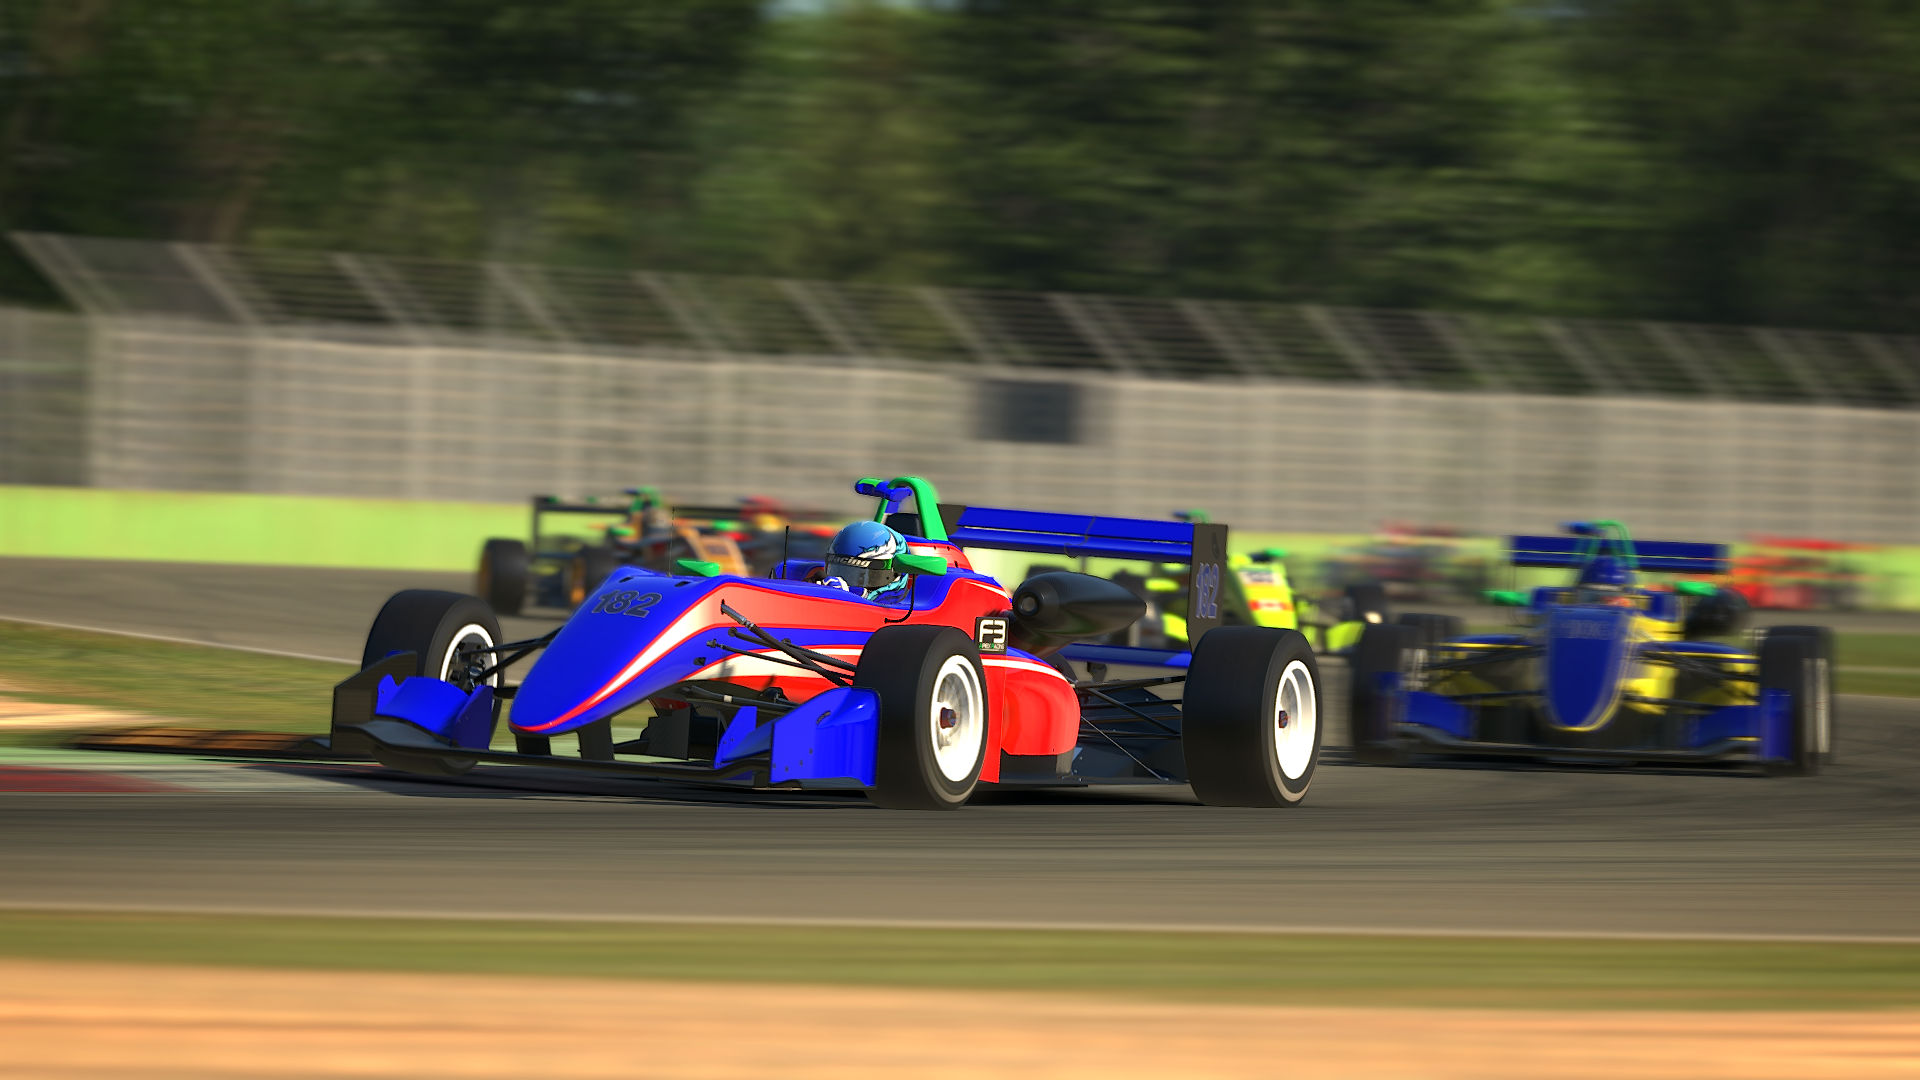 Racing Academy F3